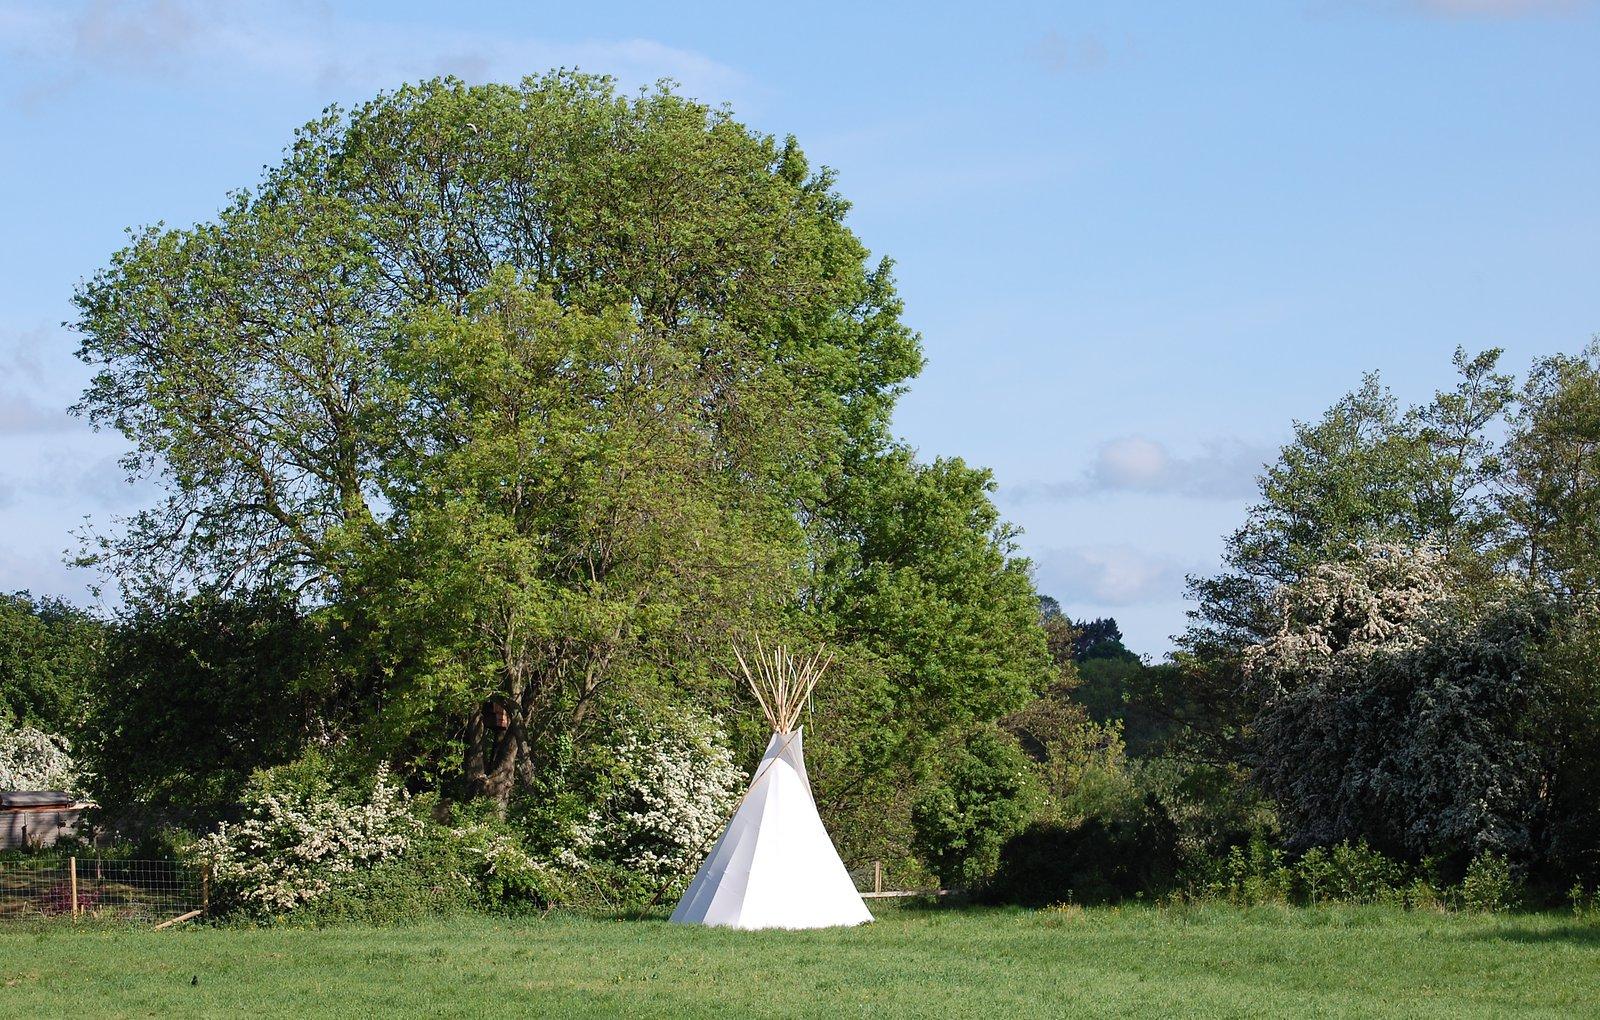 White Teepee Near North Bridge In Ripon